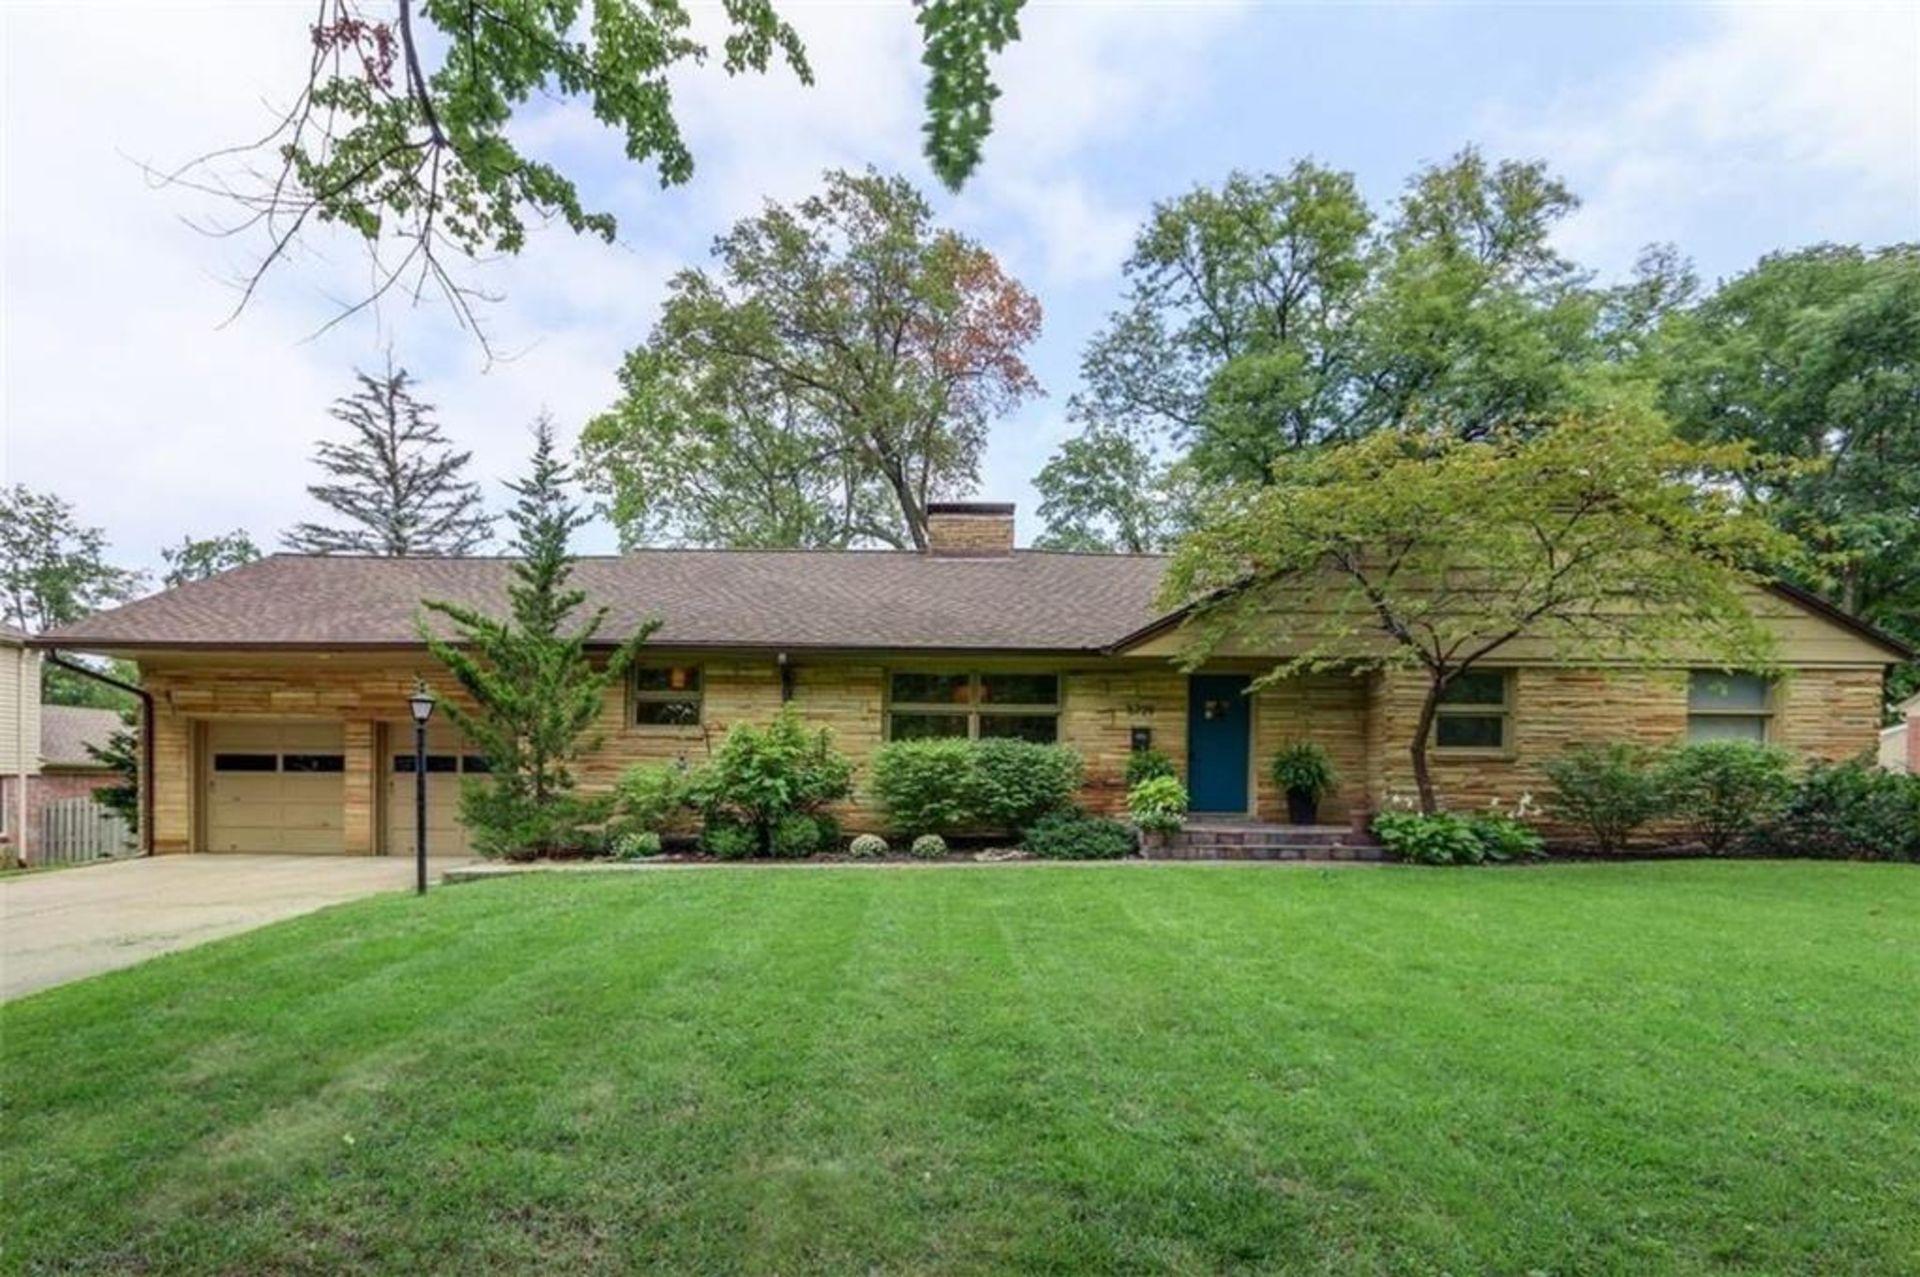 Home in Reinhardt Estate for Sale